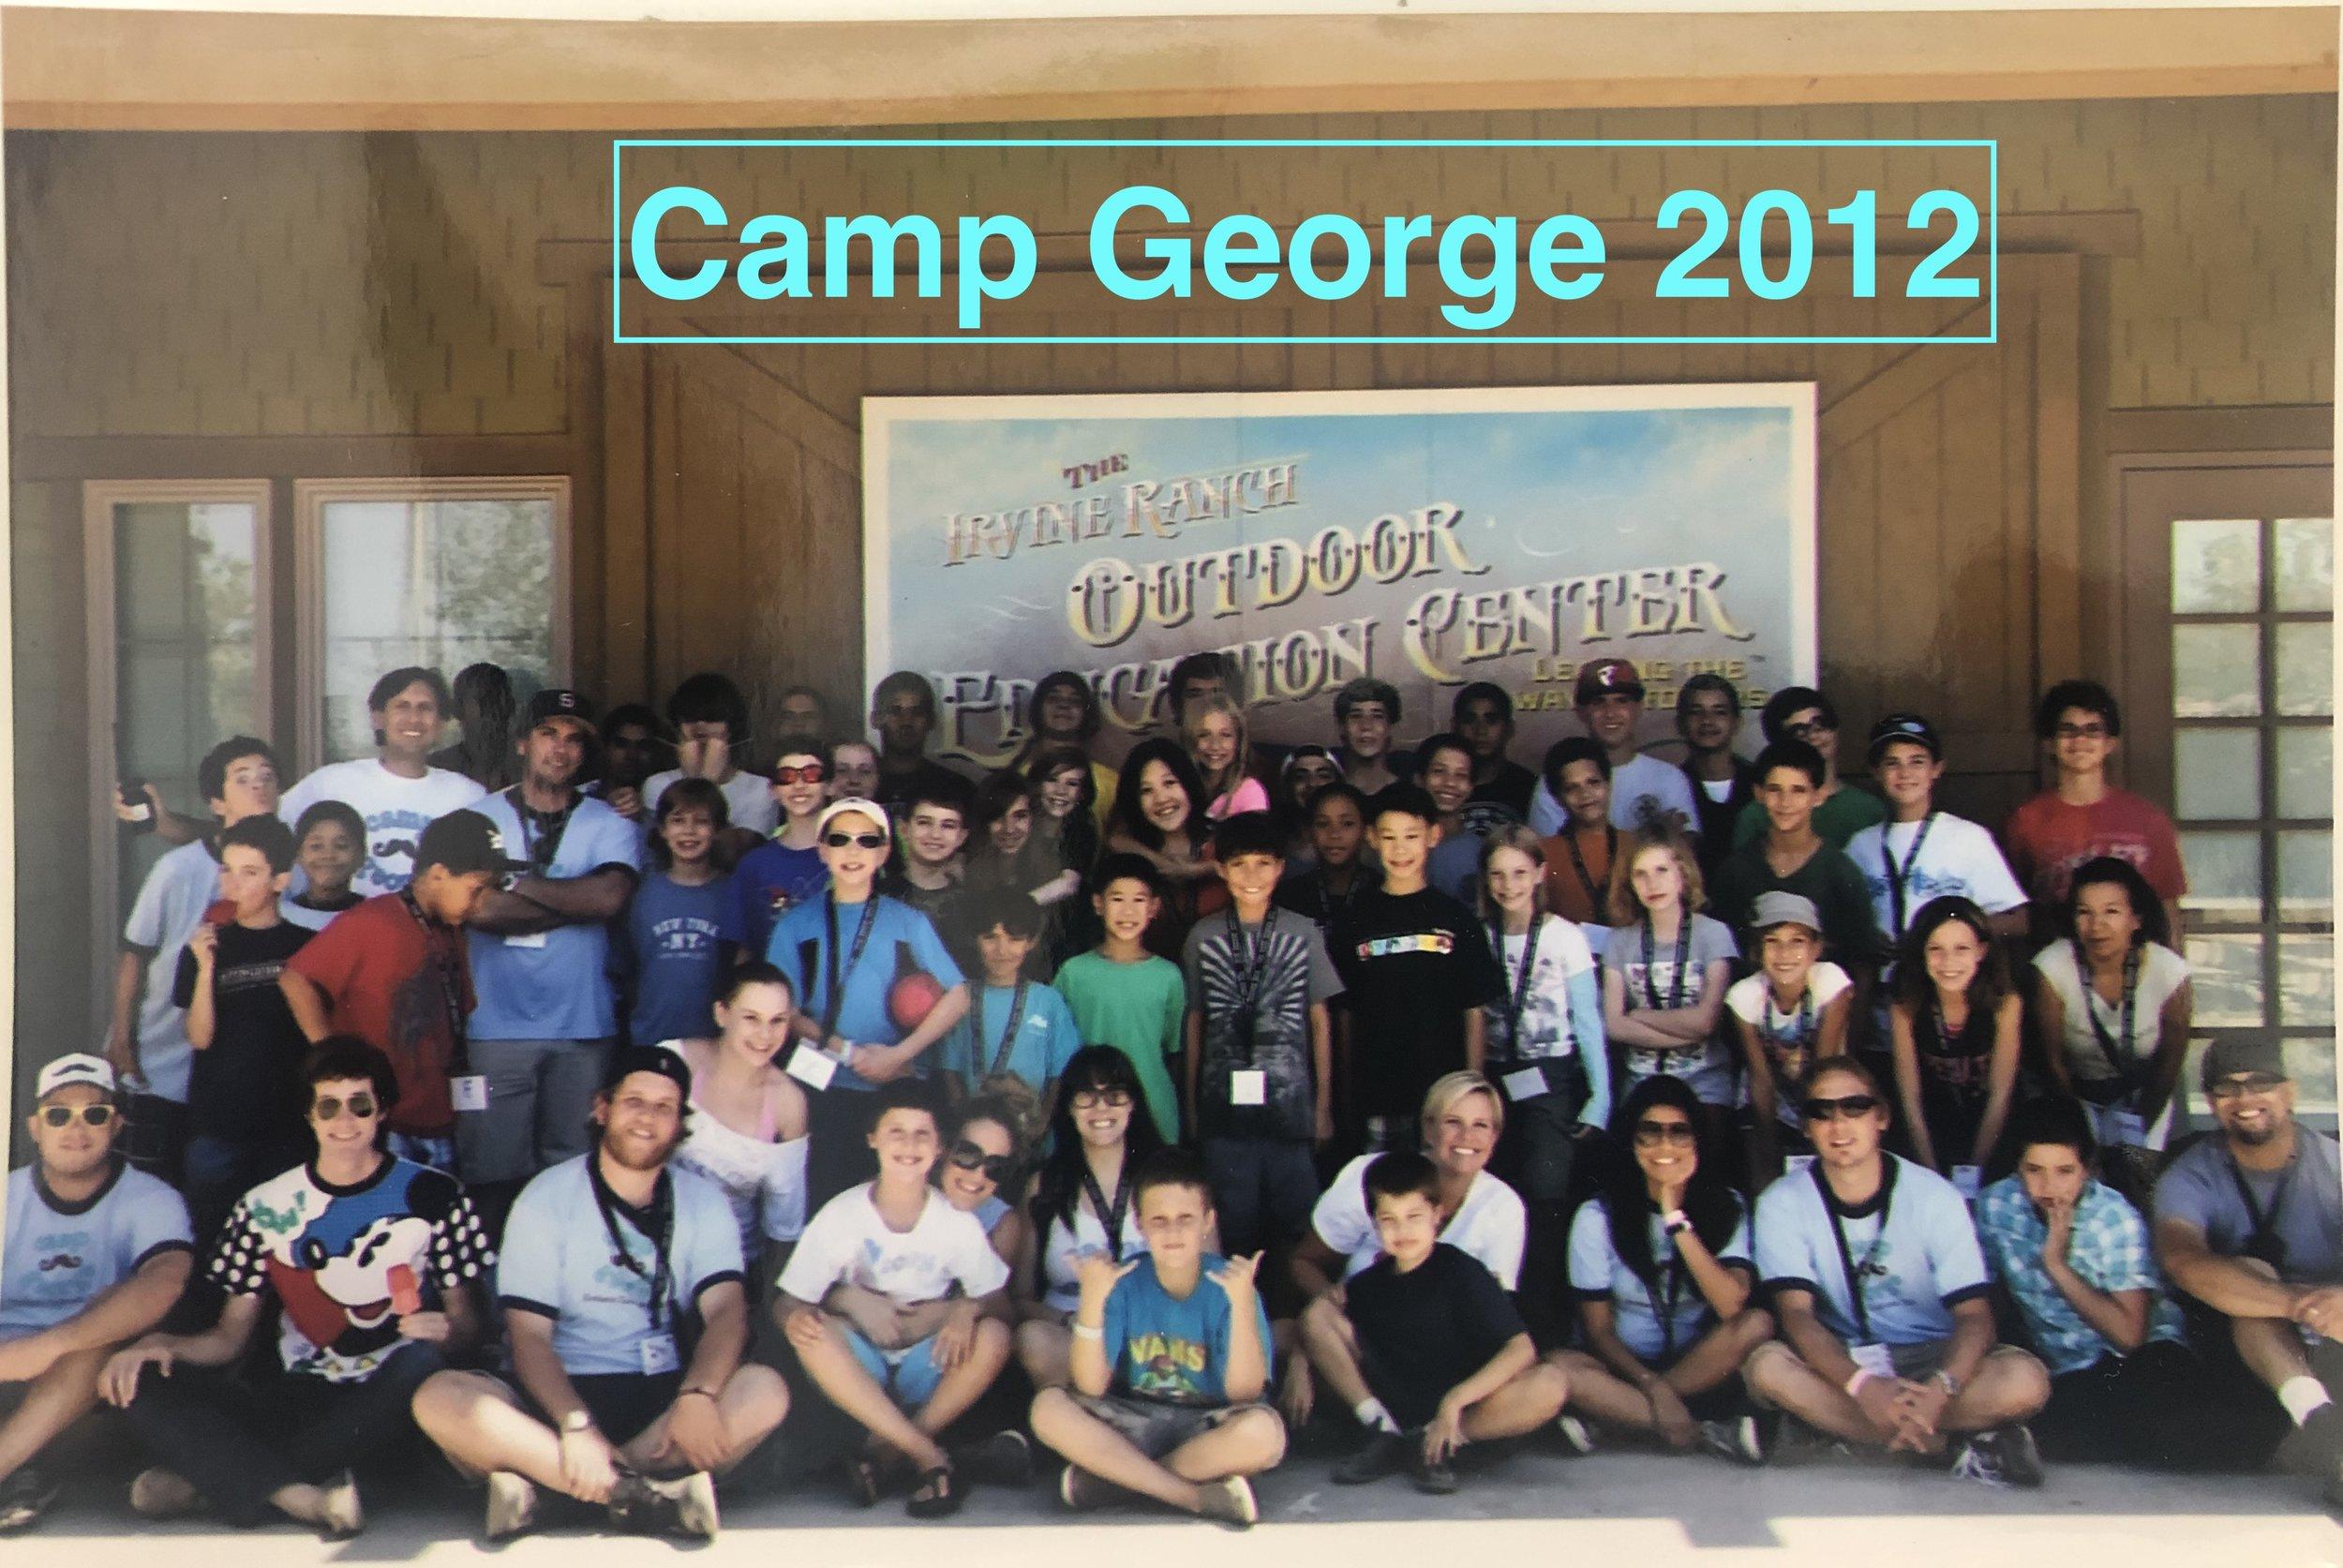 Camp George 2012 Group Photo.jpg